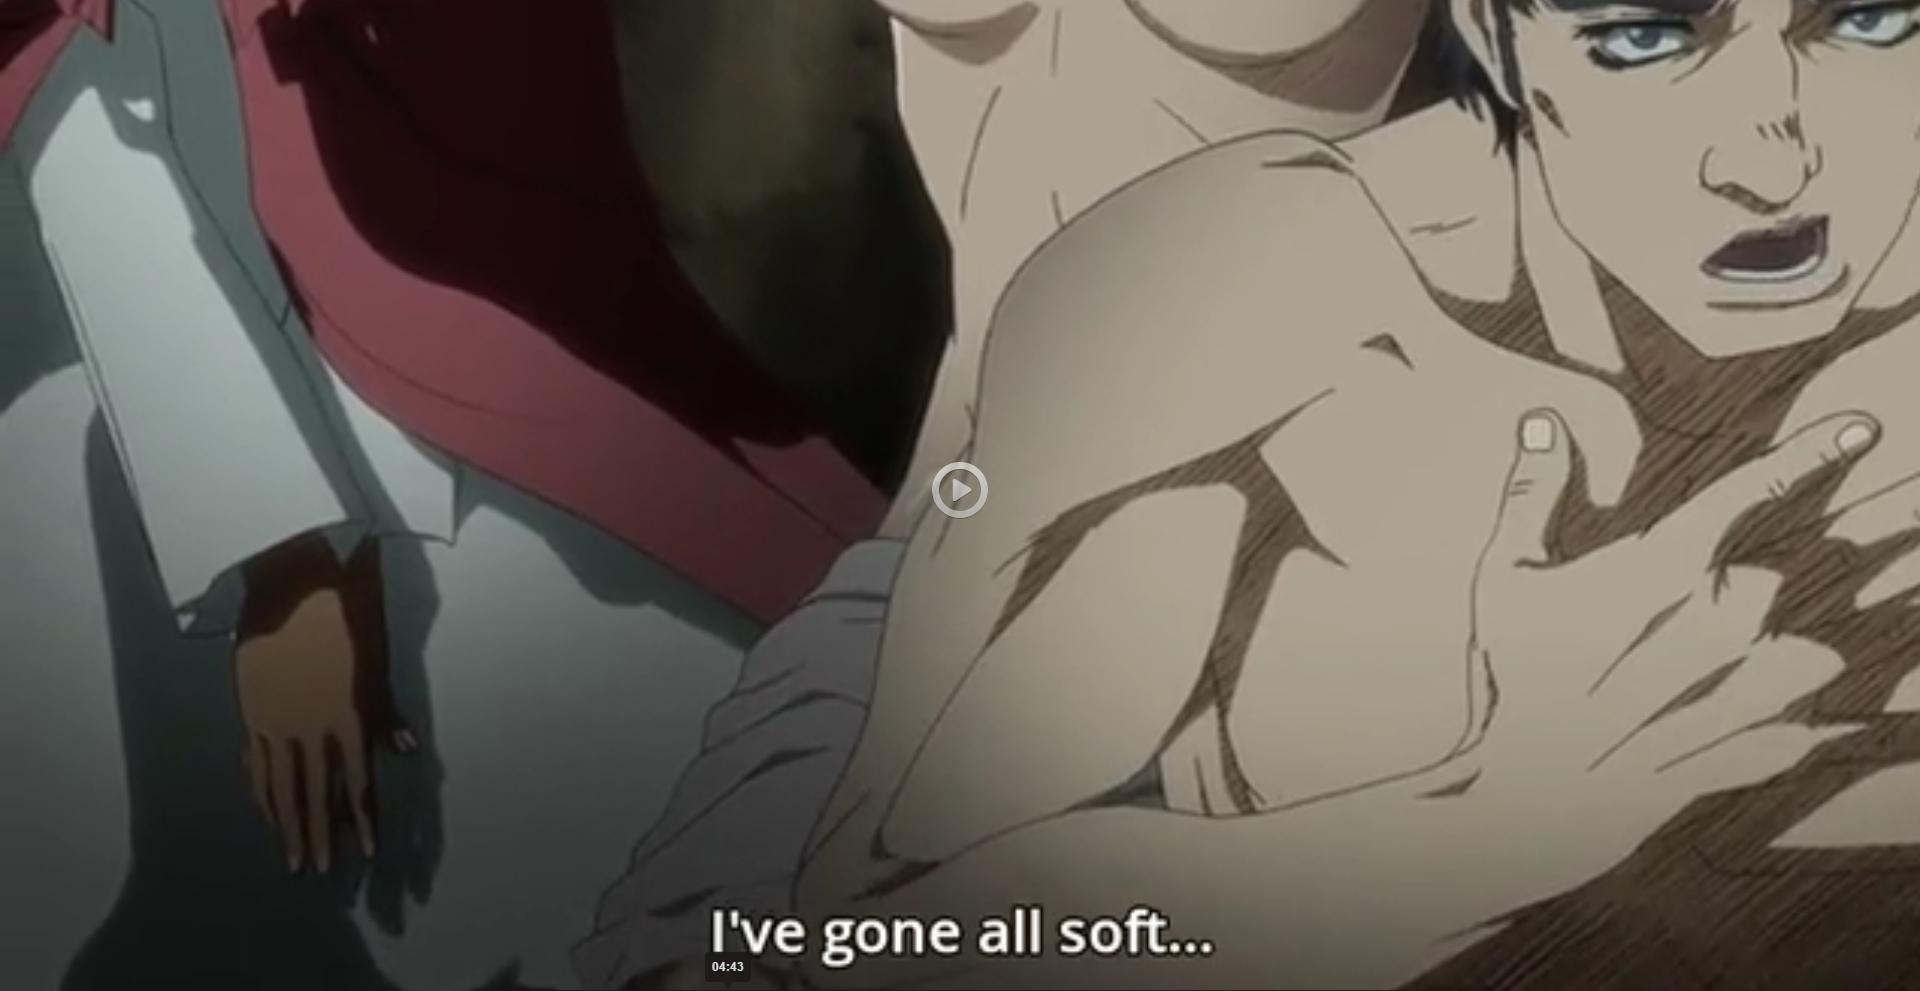 All Sex Anime berserk episode 5 discussion - forums - myanimelist